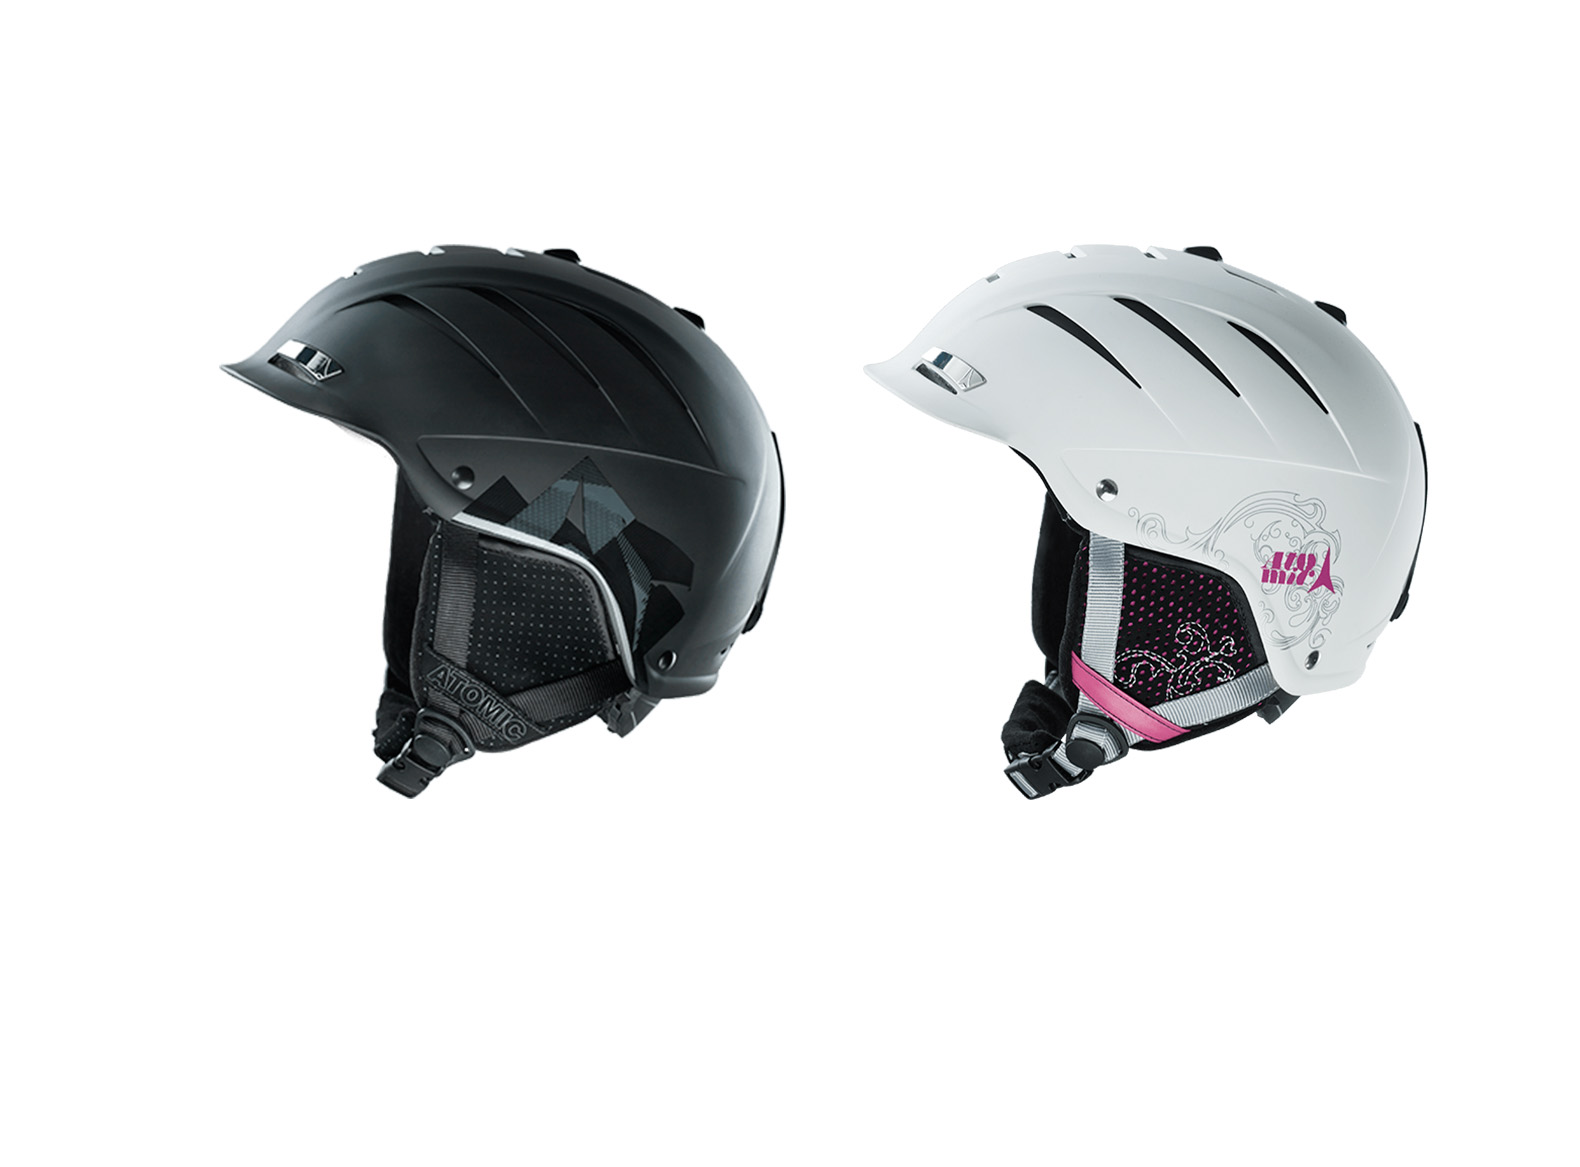 Protection-ski-snb-helmet-helm-erwachsen-Rent-sport-SAILER-Seefeld-Rosshuette-Tirol-Oesterreich-003